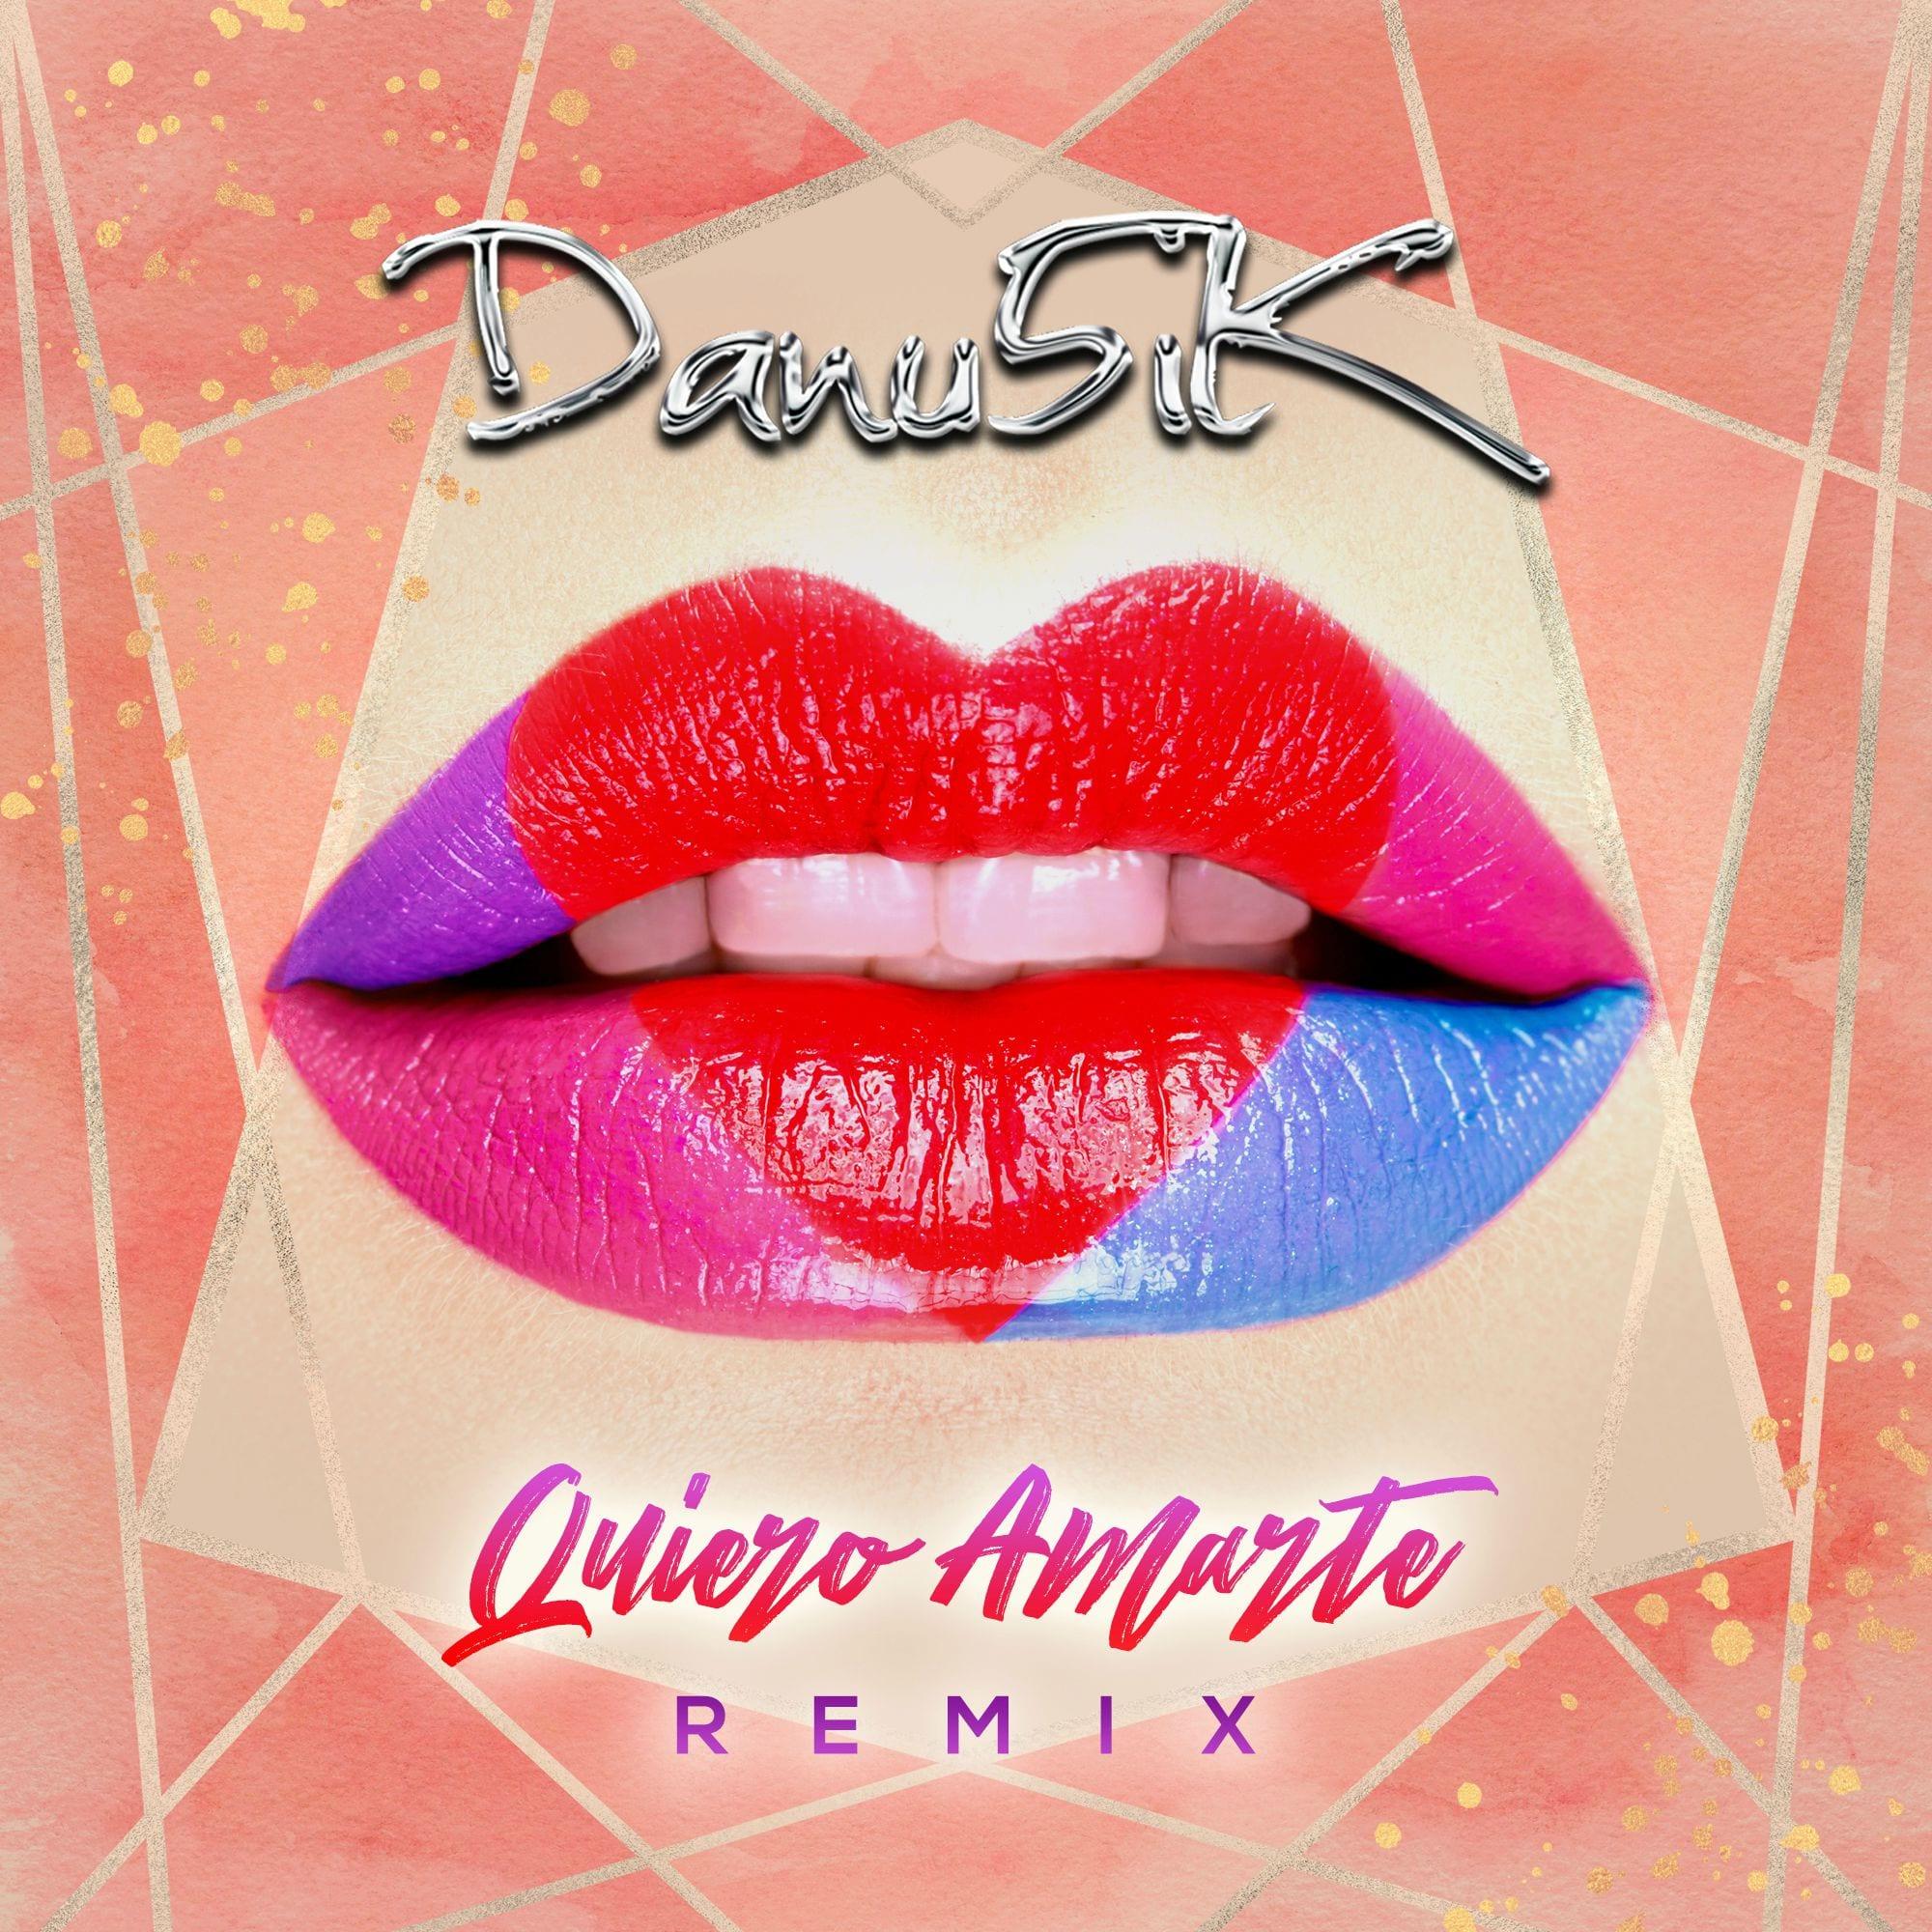 Danu5ik Quiero Amarte (Remix)